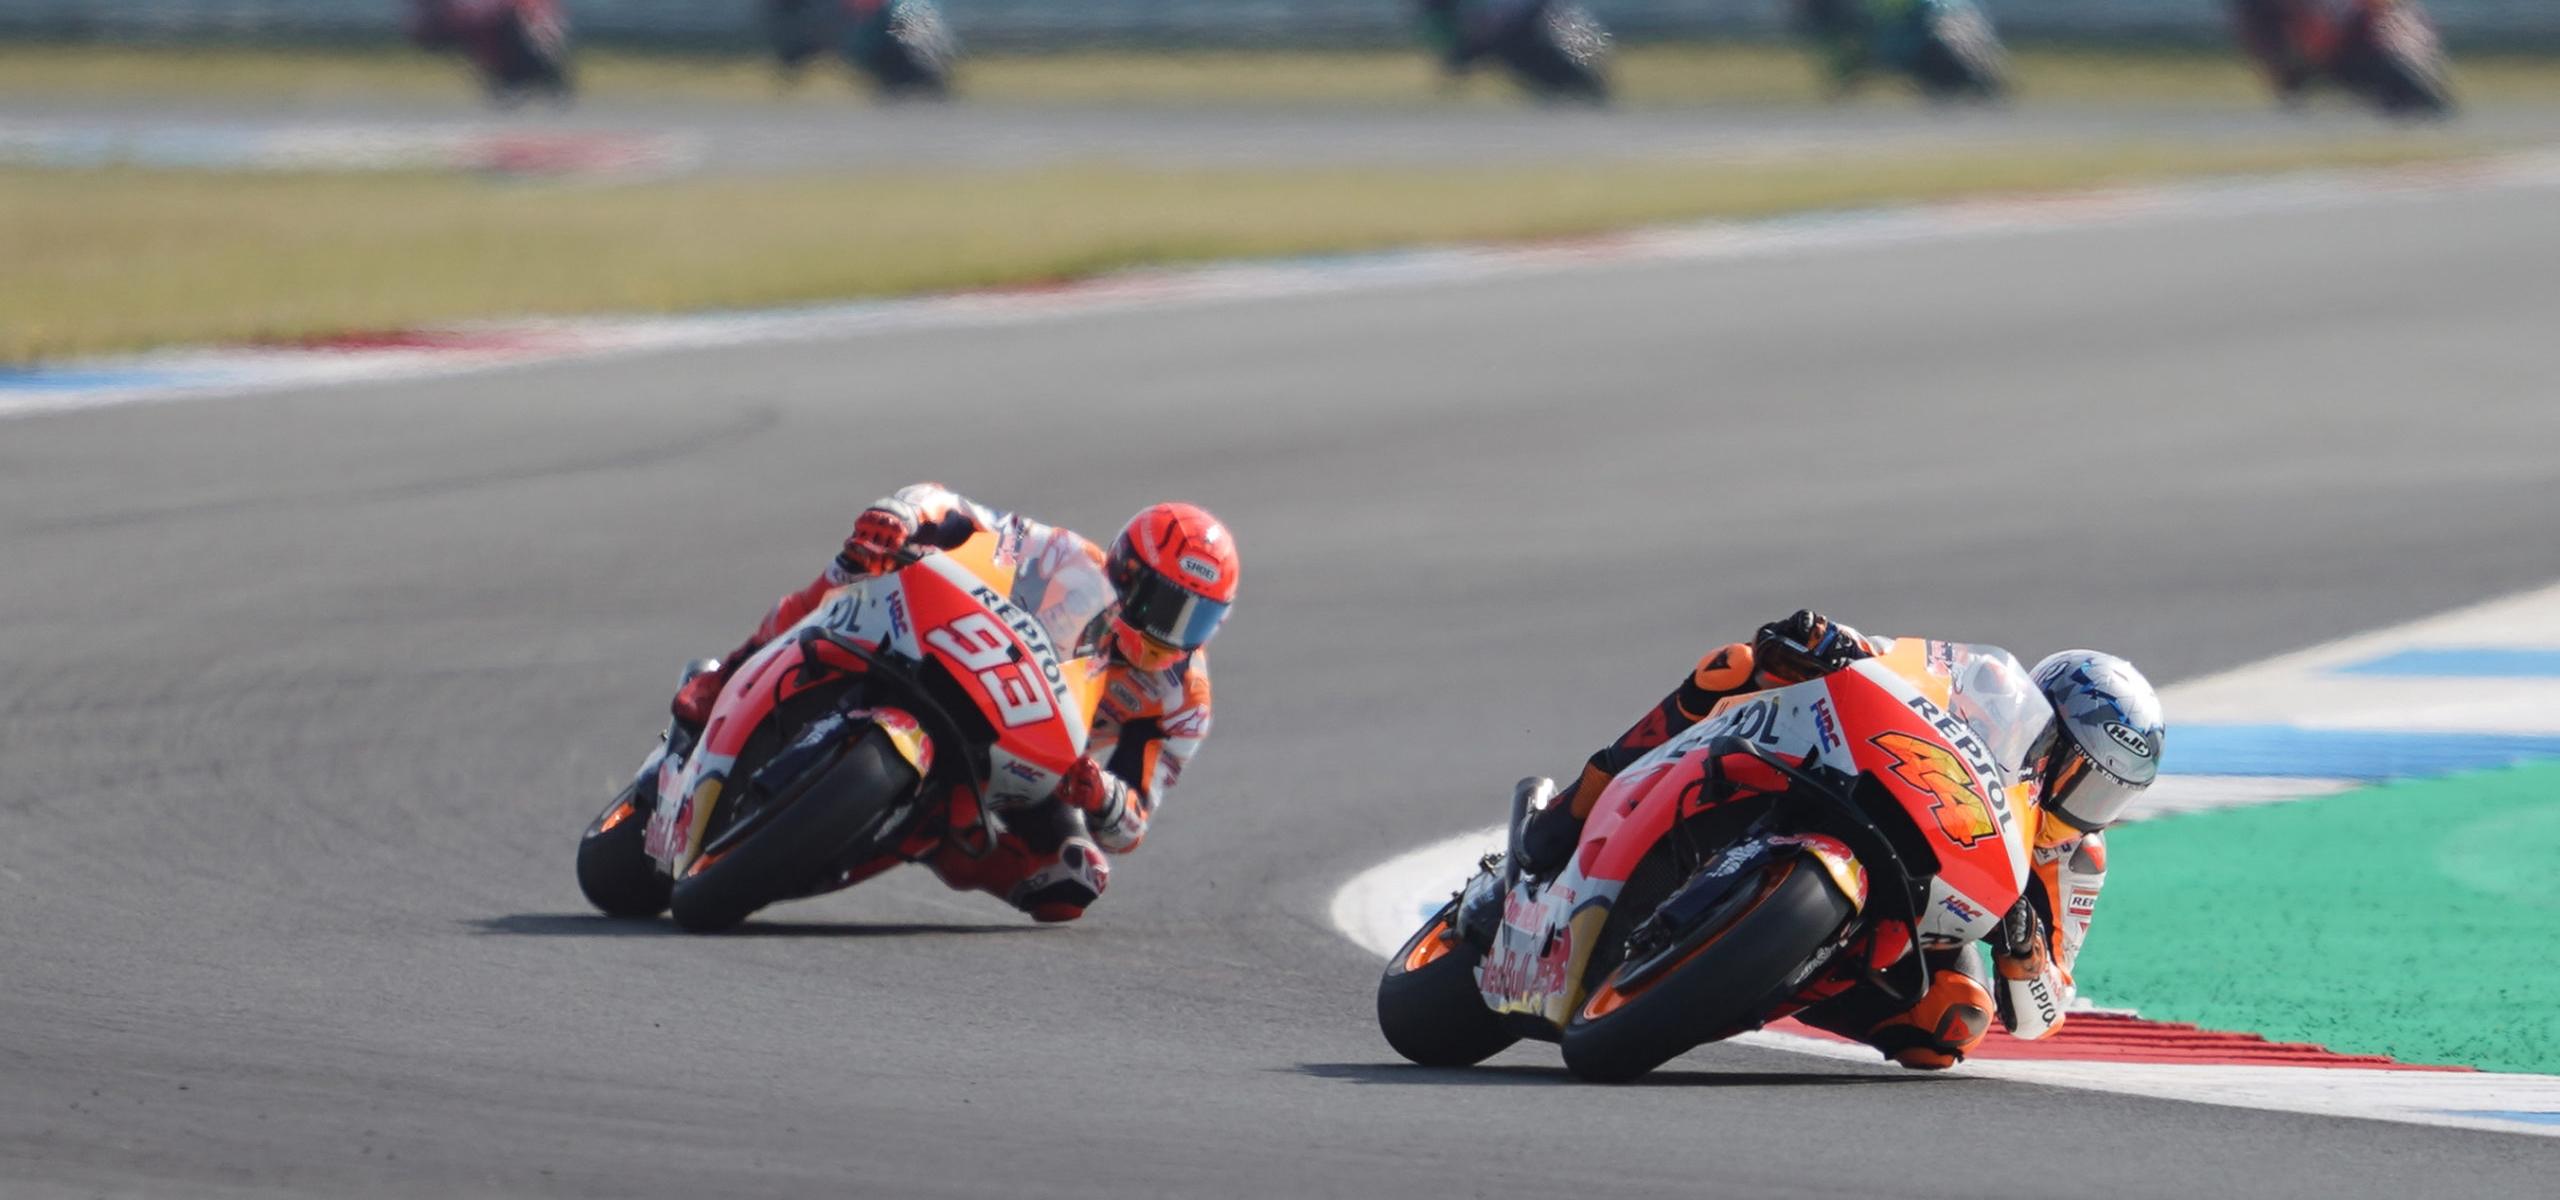 Repsol Honda Team back in the saddle in Austria